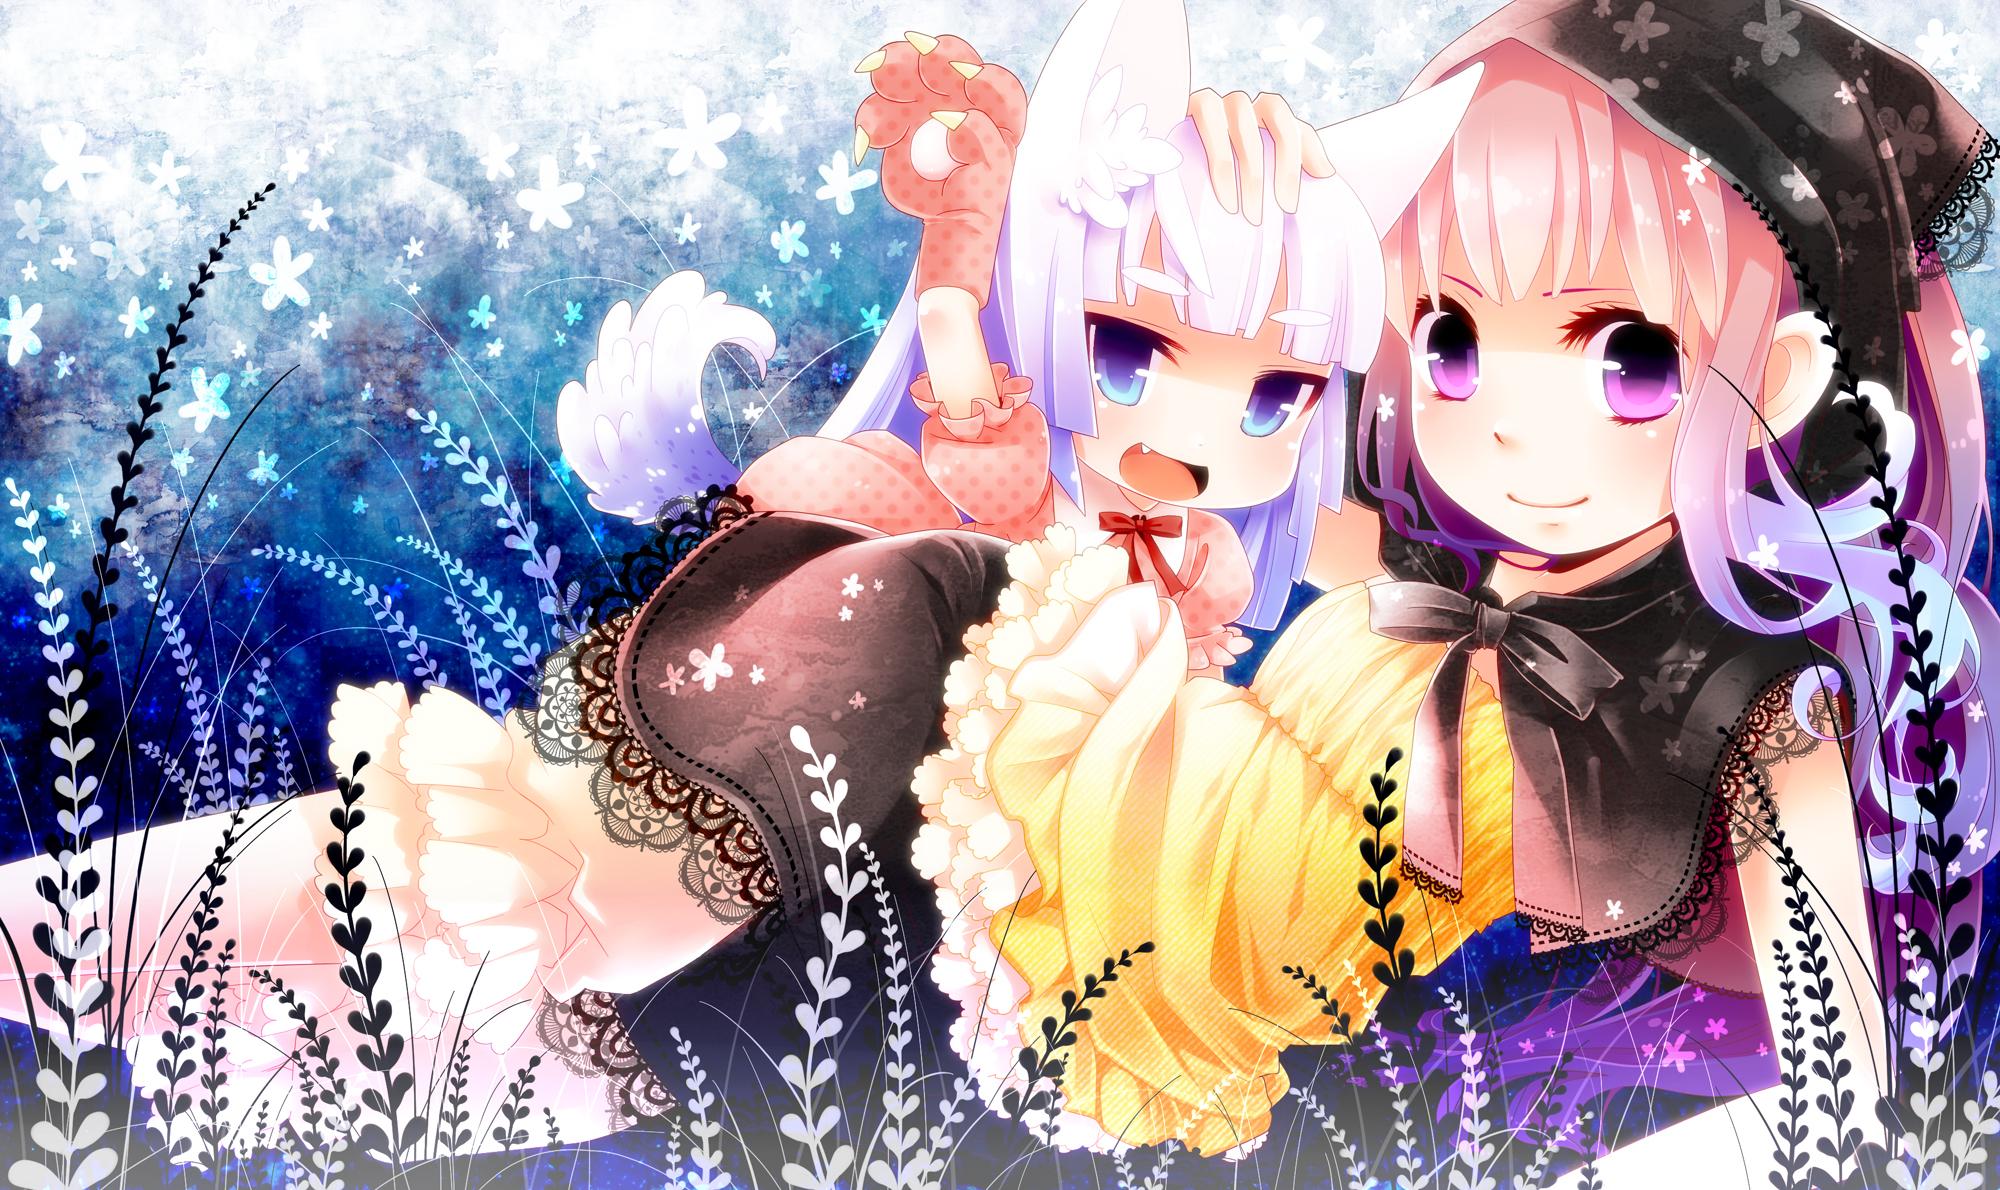 2girls animal_ears blue_eyes blush catgirl dress gray_hair long_hair moonyan purple_eyes purple_hair tail